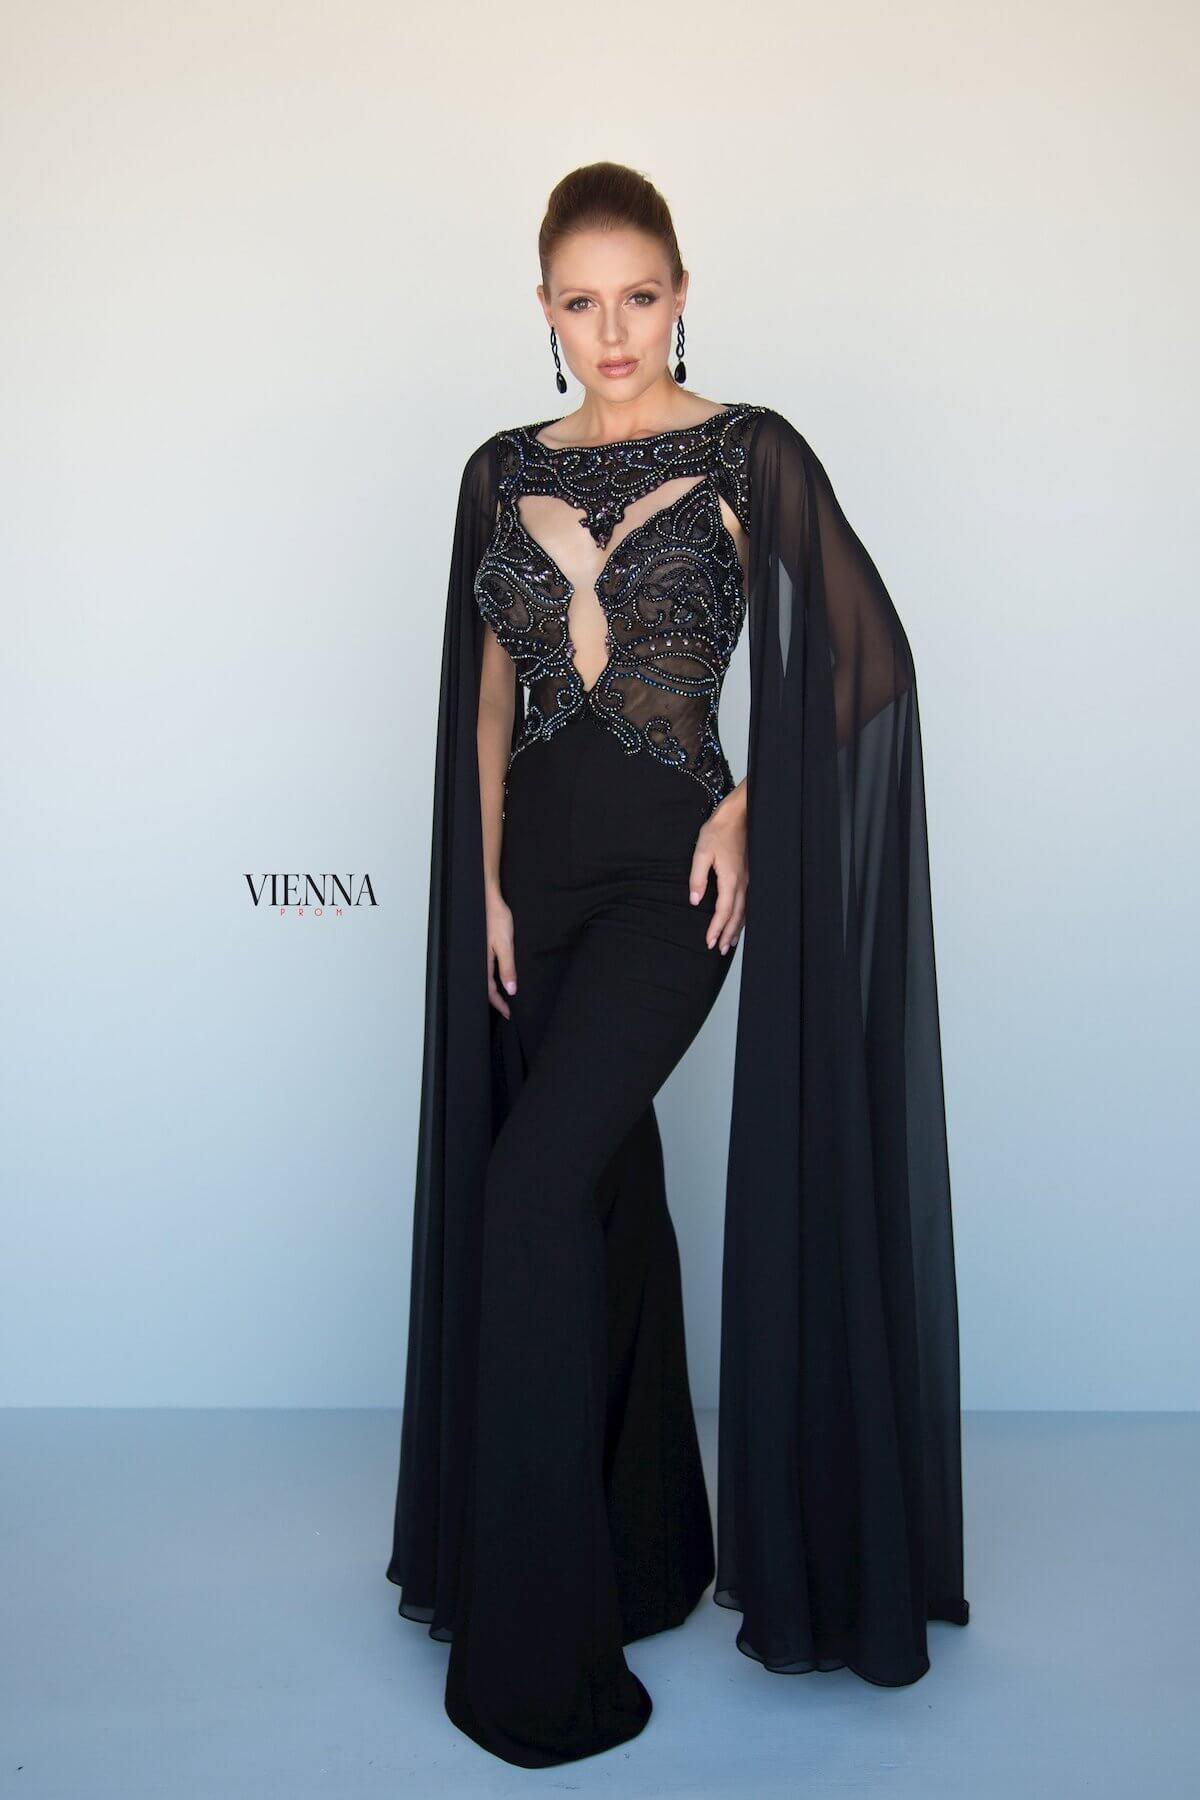 Style 9964 Vienna Black Size 2 Fun Fashion Plunge Romper/Jumpsuit Dress on Queenly